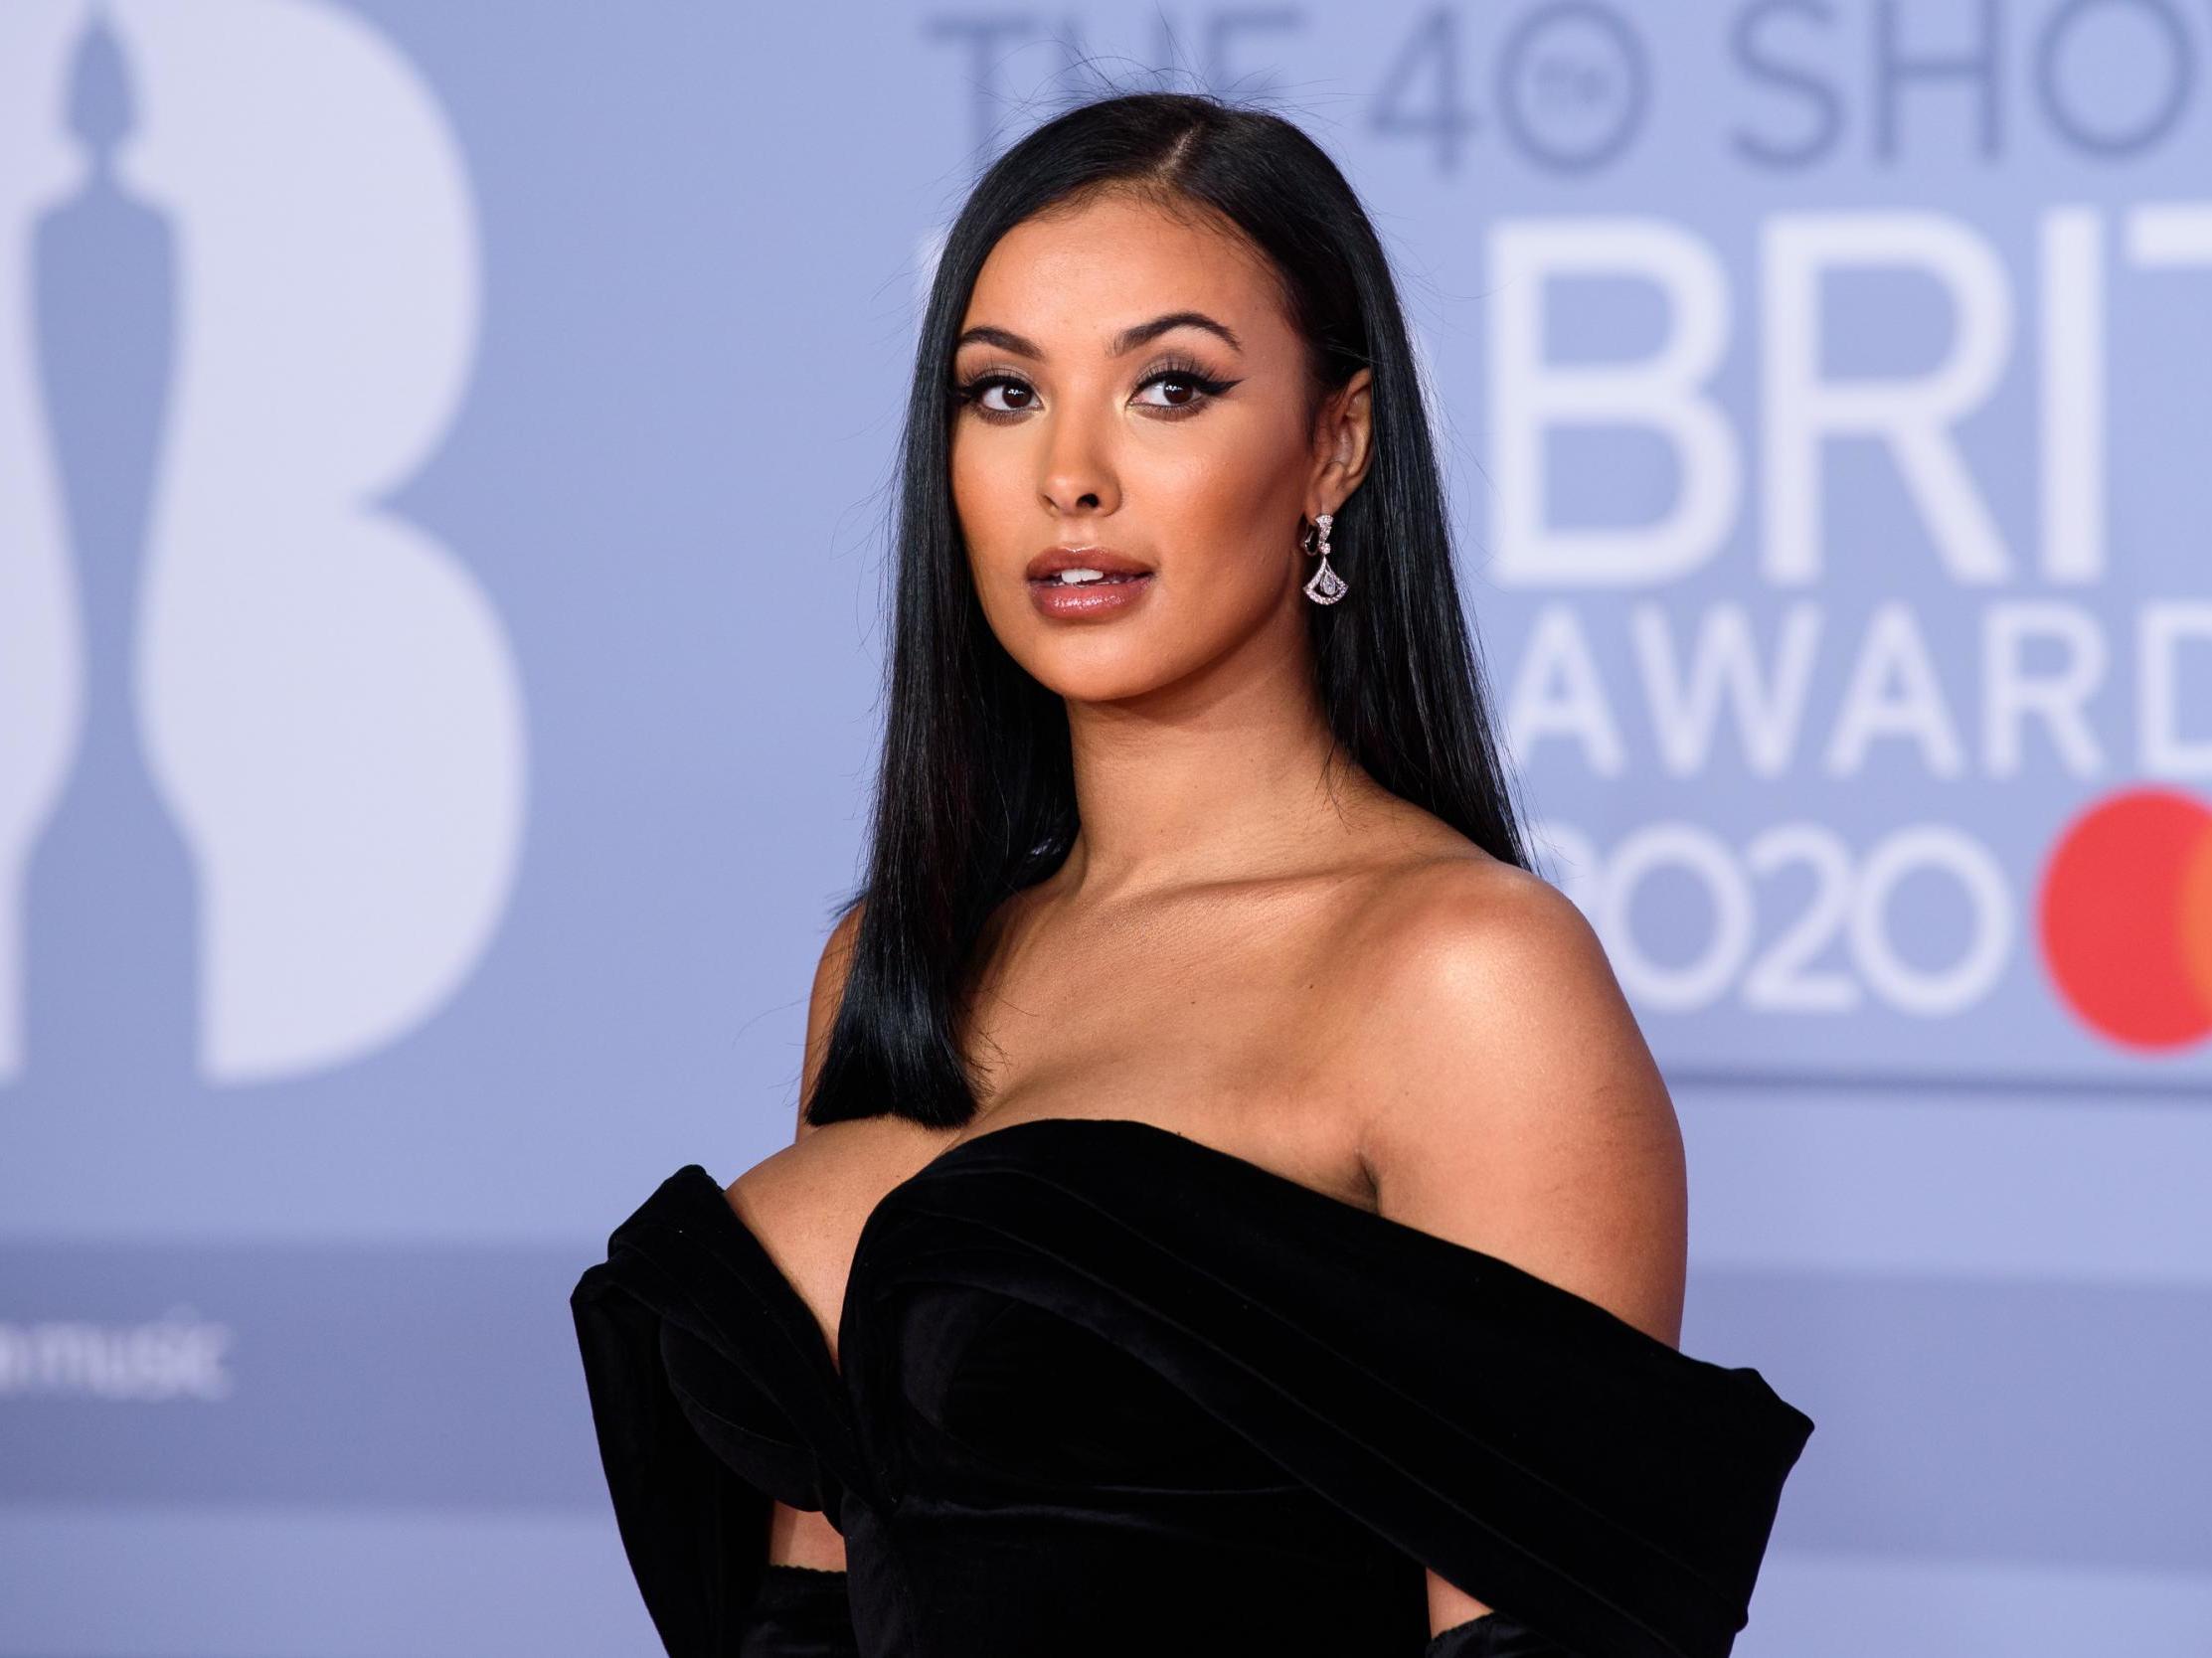 Maya Jama quits BBC Radio 1 after two years